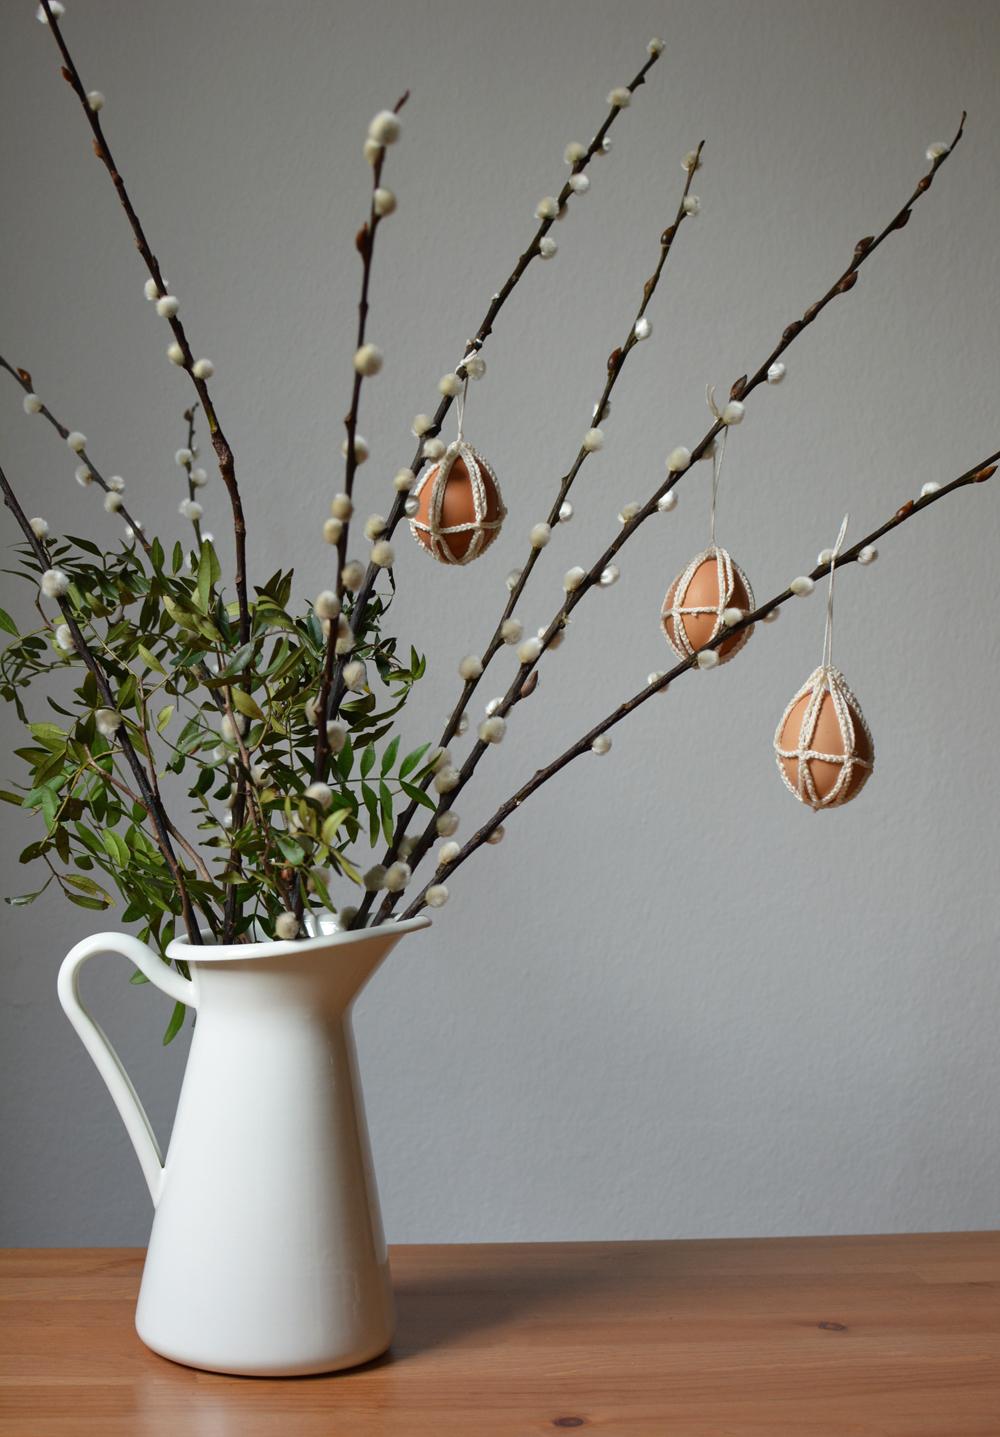 Osterstrauch |we love handmade